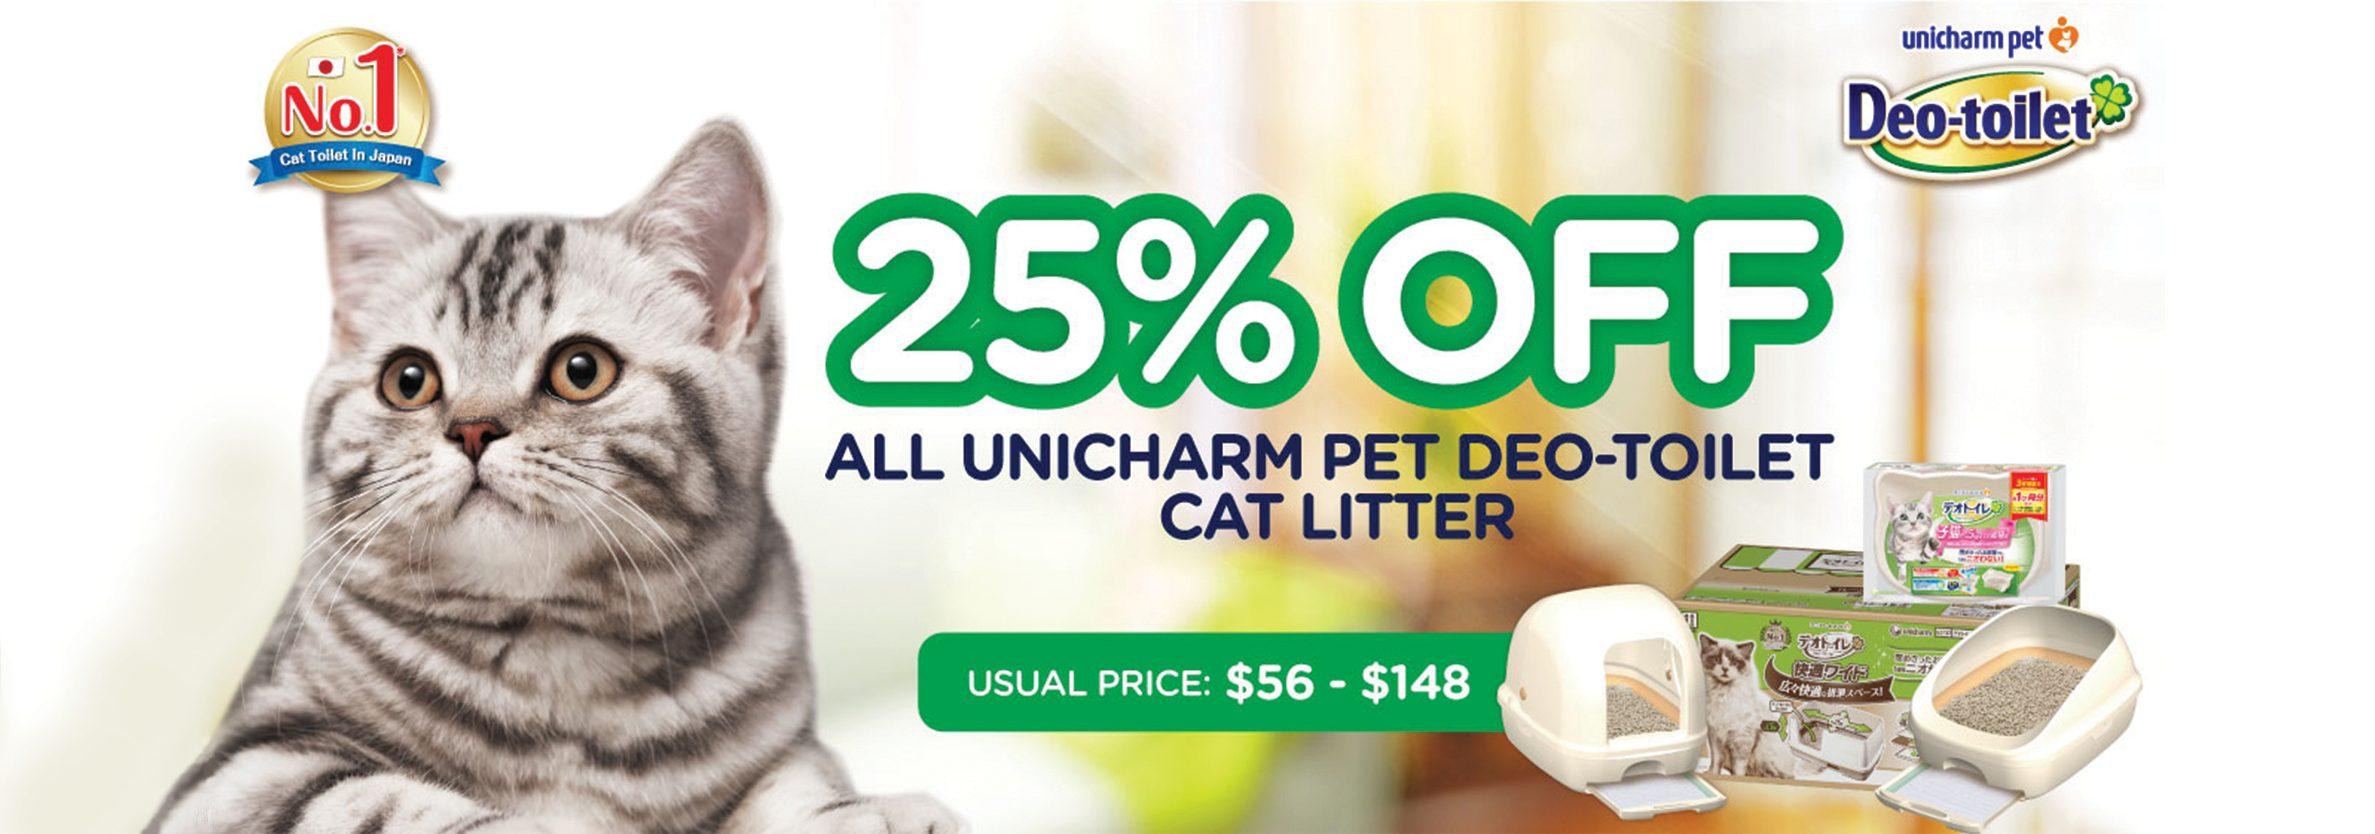 Unicharm pet deo-toilet cat litter banner